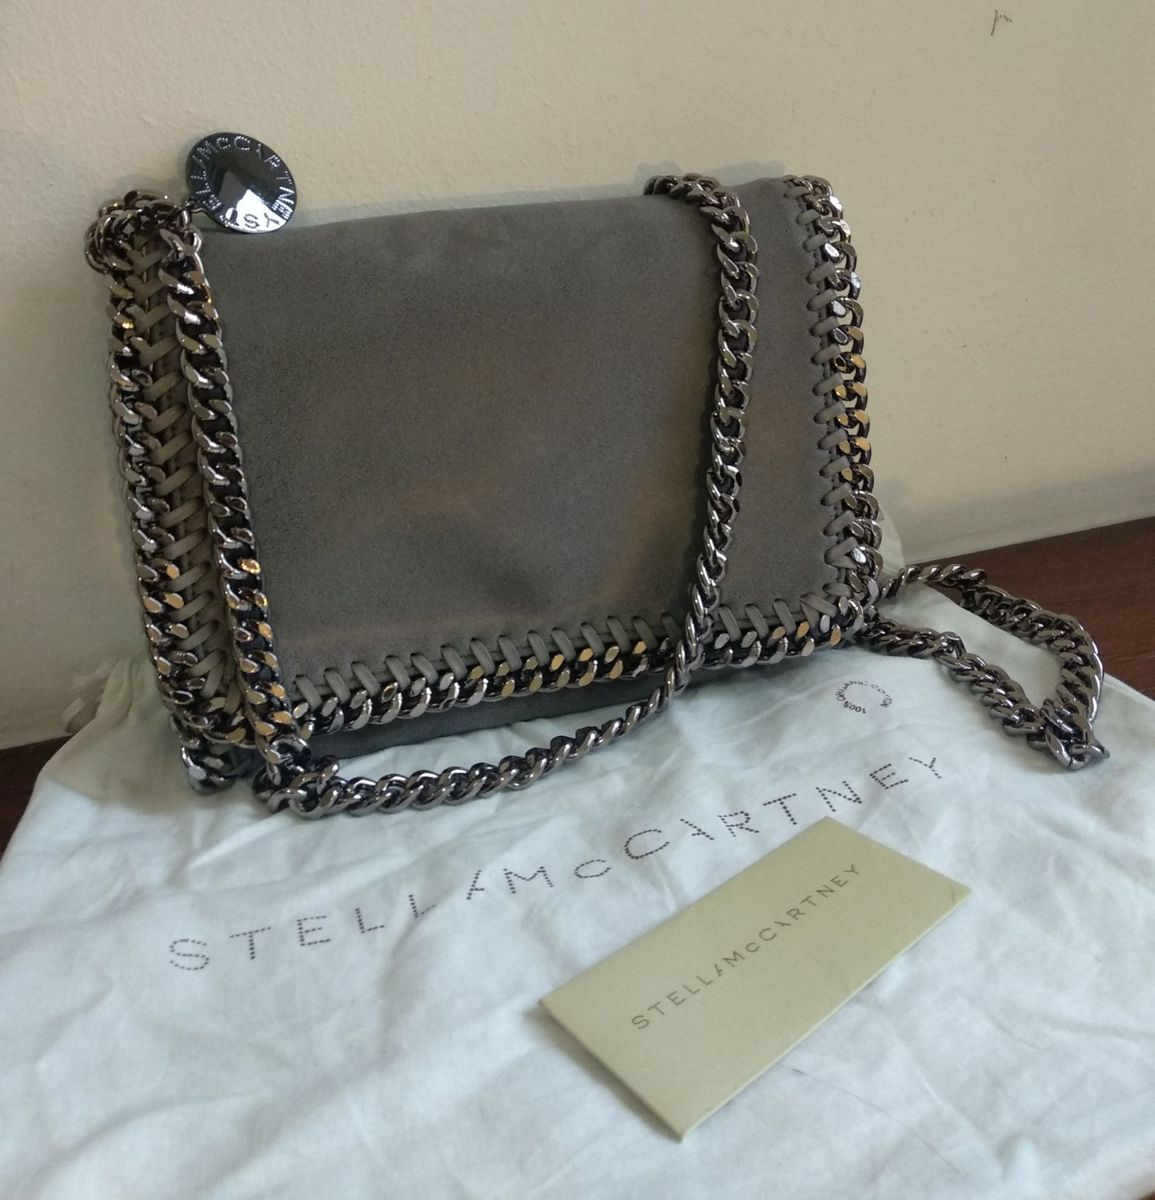 731b09247 Bolsinha Falabella Stella Mccartney | Bolsa de Ombro Feminina Stella ...